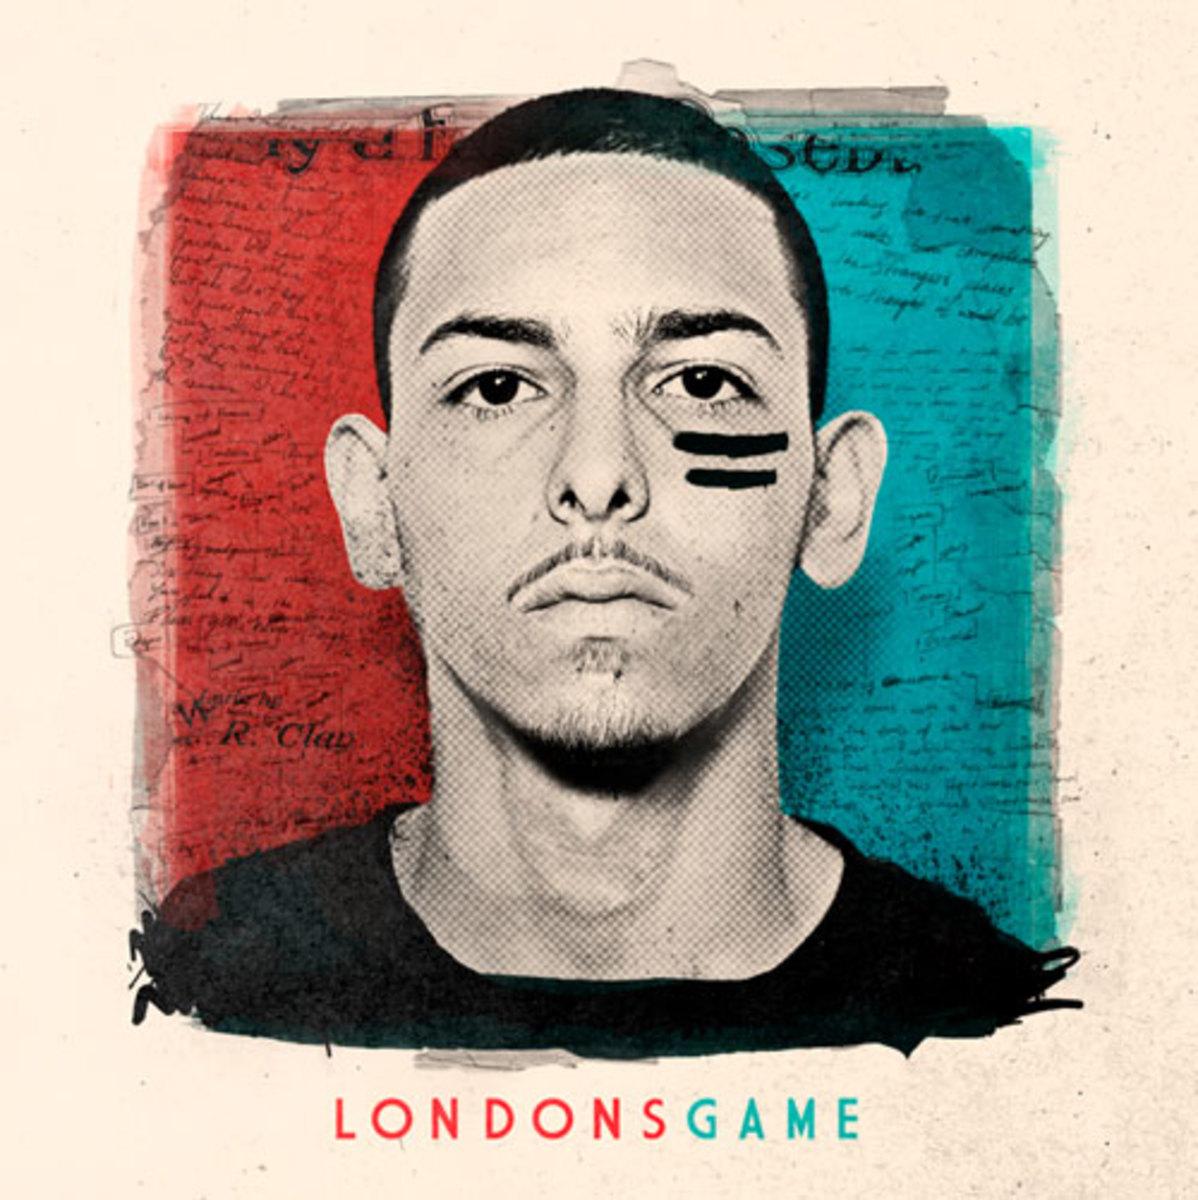 nicklondon-londonsgame.jpg